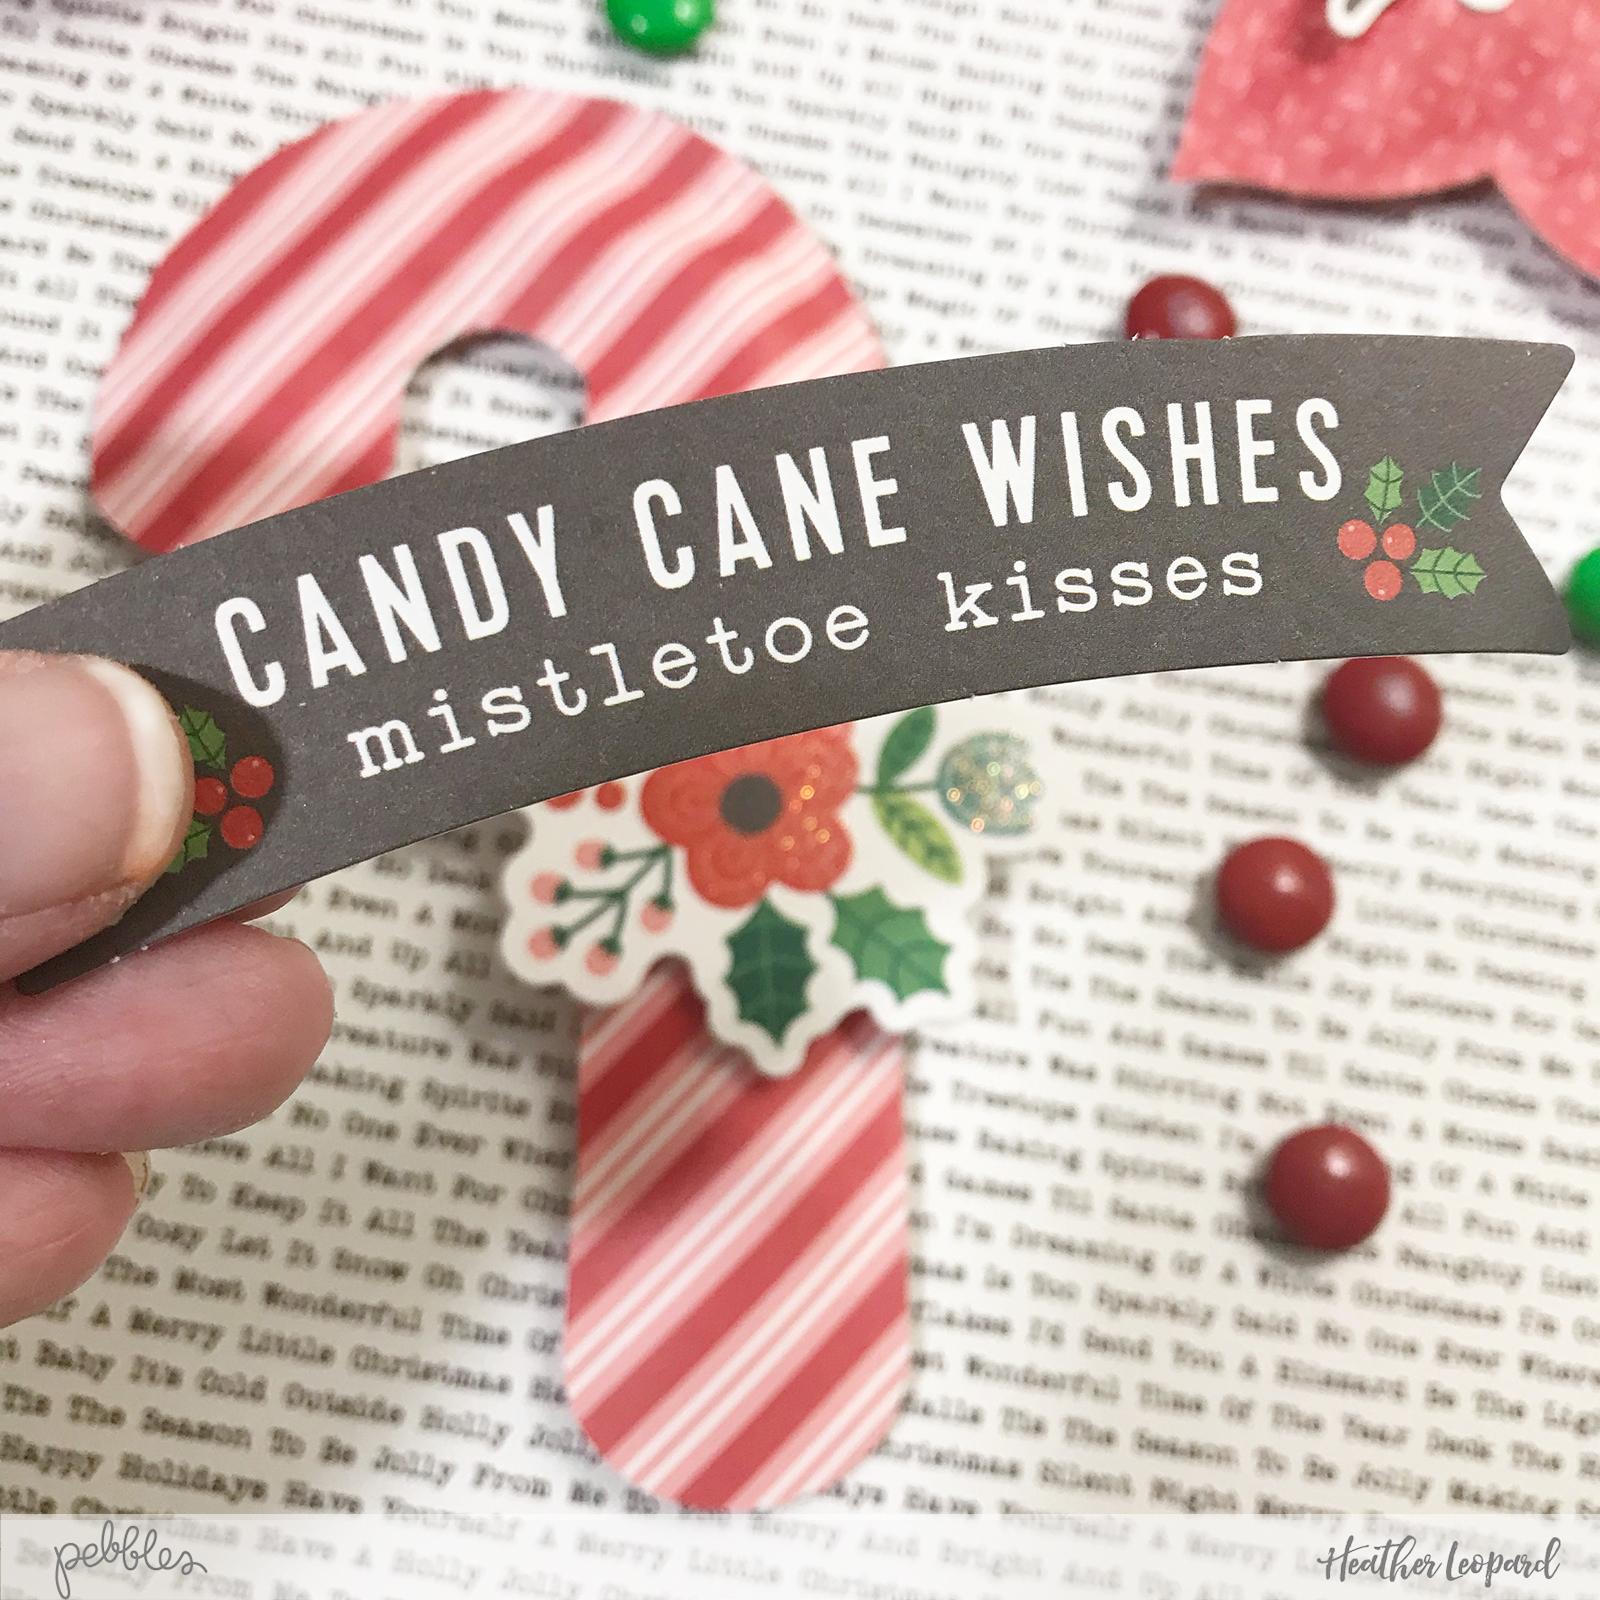 Christmas Treats by @HeatherLeopard using the @PebblesInc #cozyandbright collection #madewithpebbles #Christmas #gifts #Christmastreats